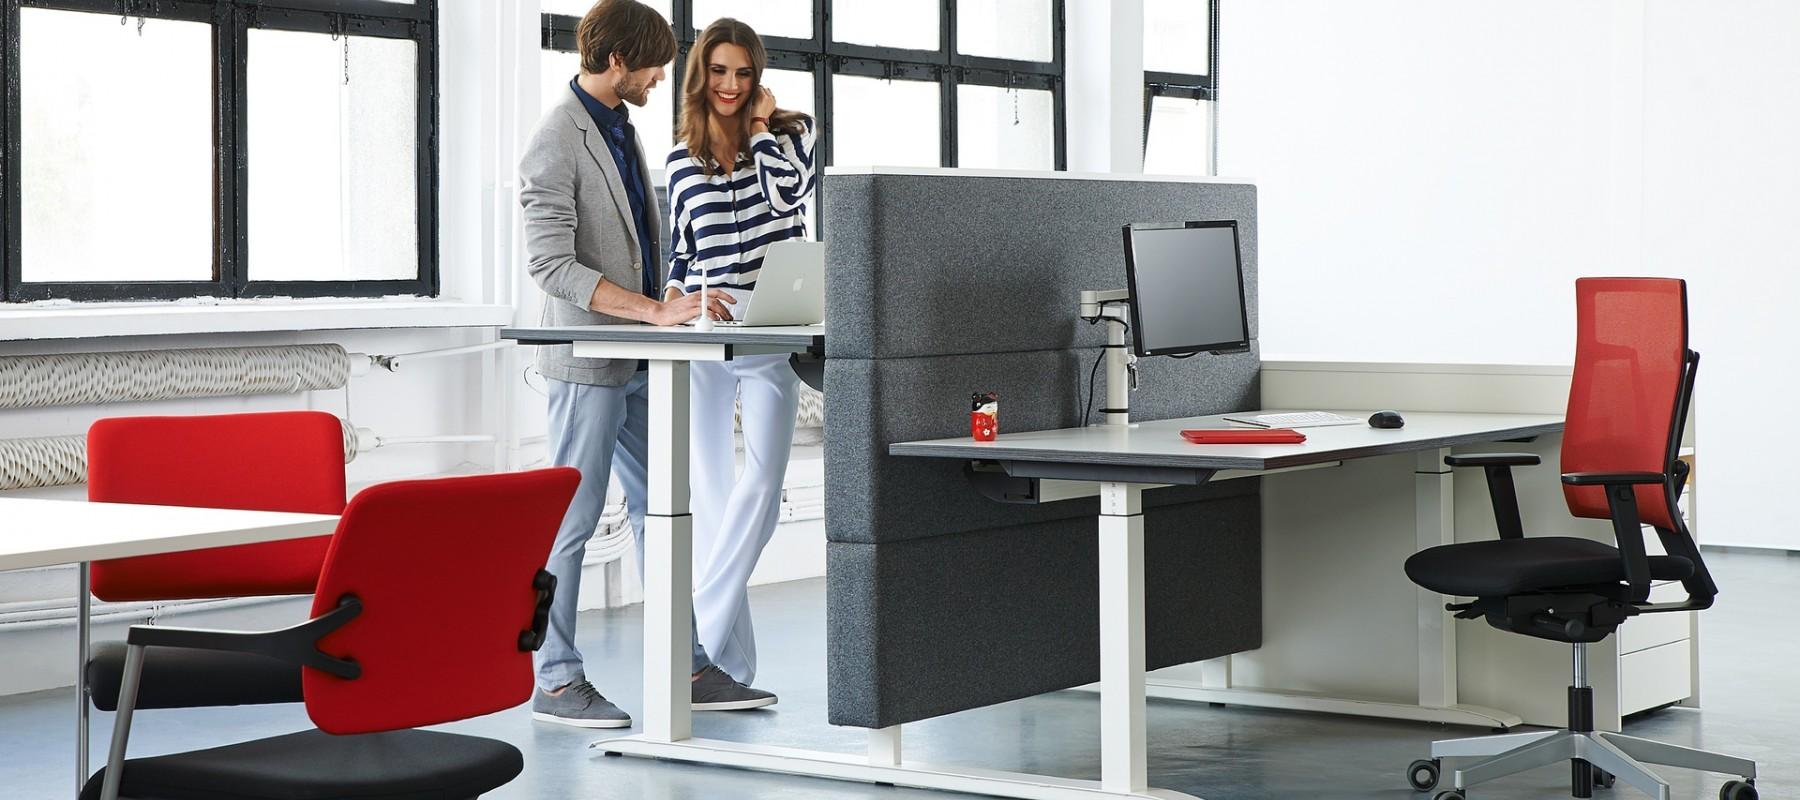 fotele-krzesla-siedziska-4me-2me-aranzacje03